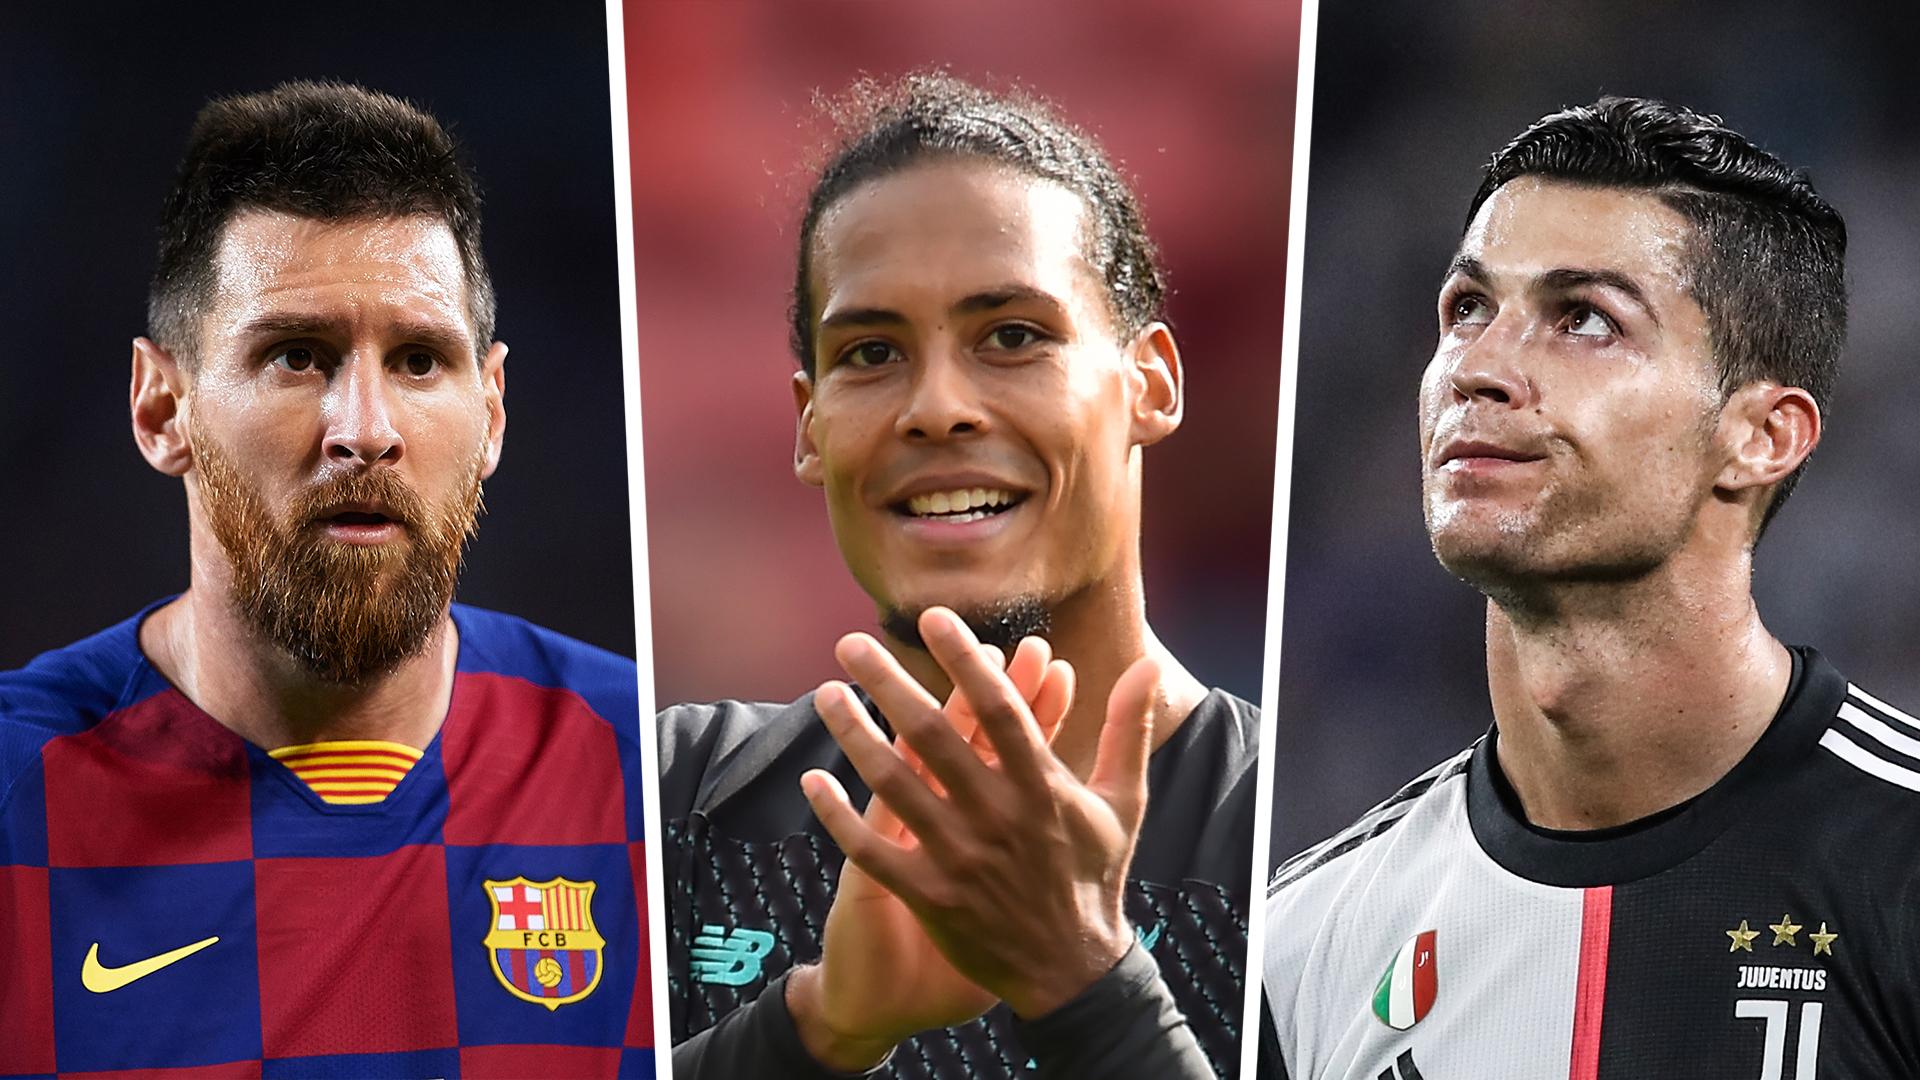 Ballon d'Or 2019: Messi, Ronaldo & Van Dijk head up list of 30 nominees